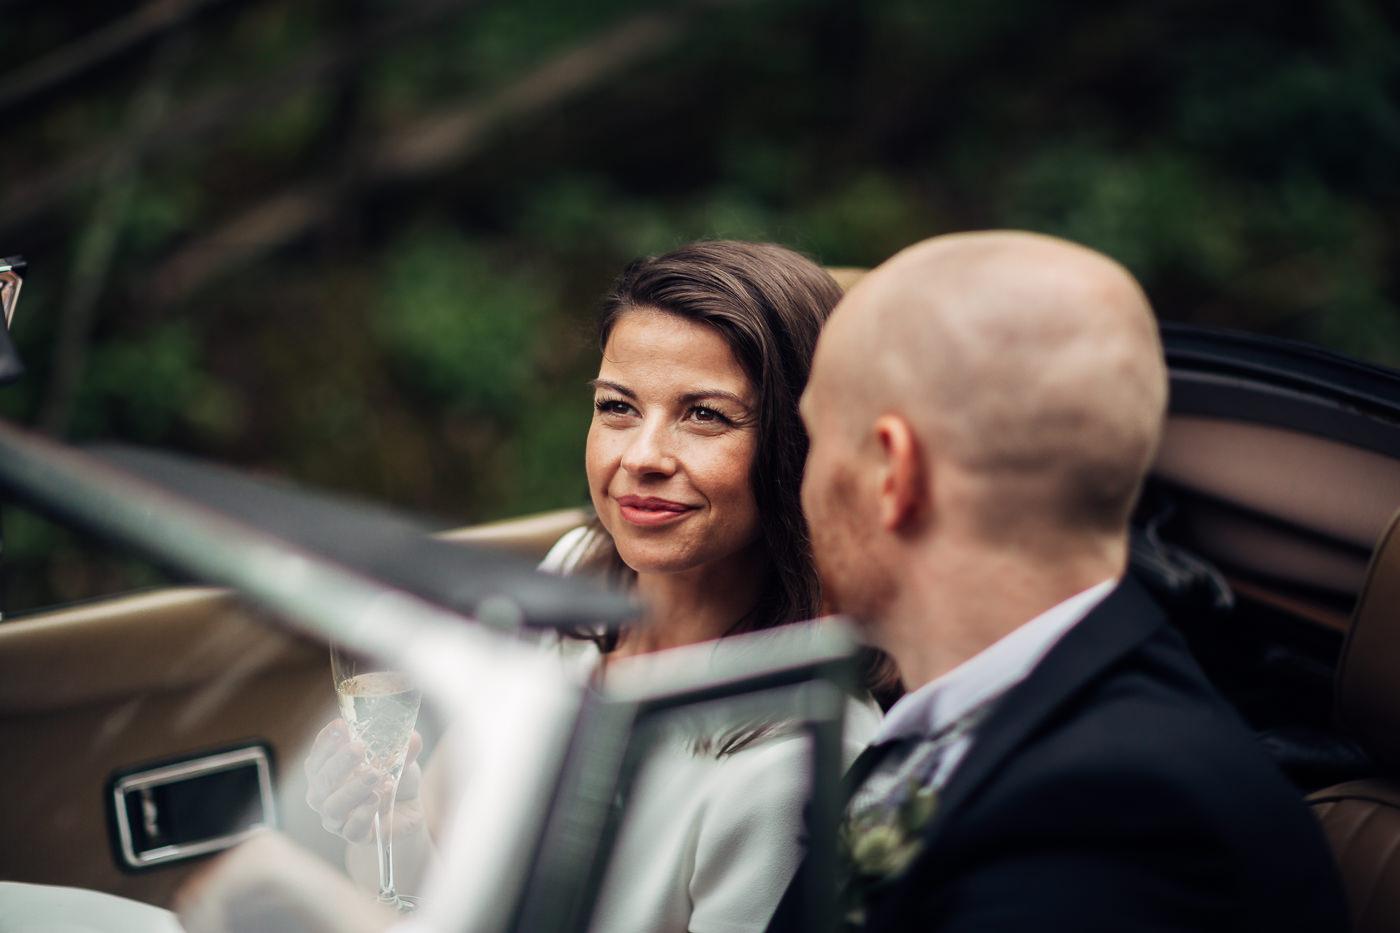 Malene & Ole Martin - elegant dansk- norskt bryllup i Oslo Bryllup Gamle Aker Oslo 27 Akershus